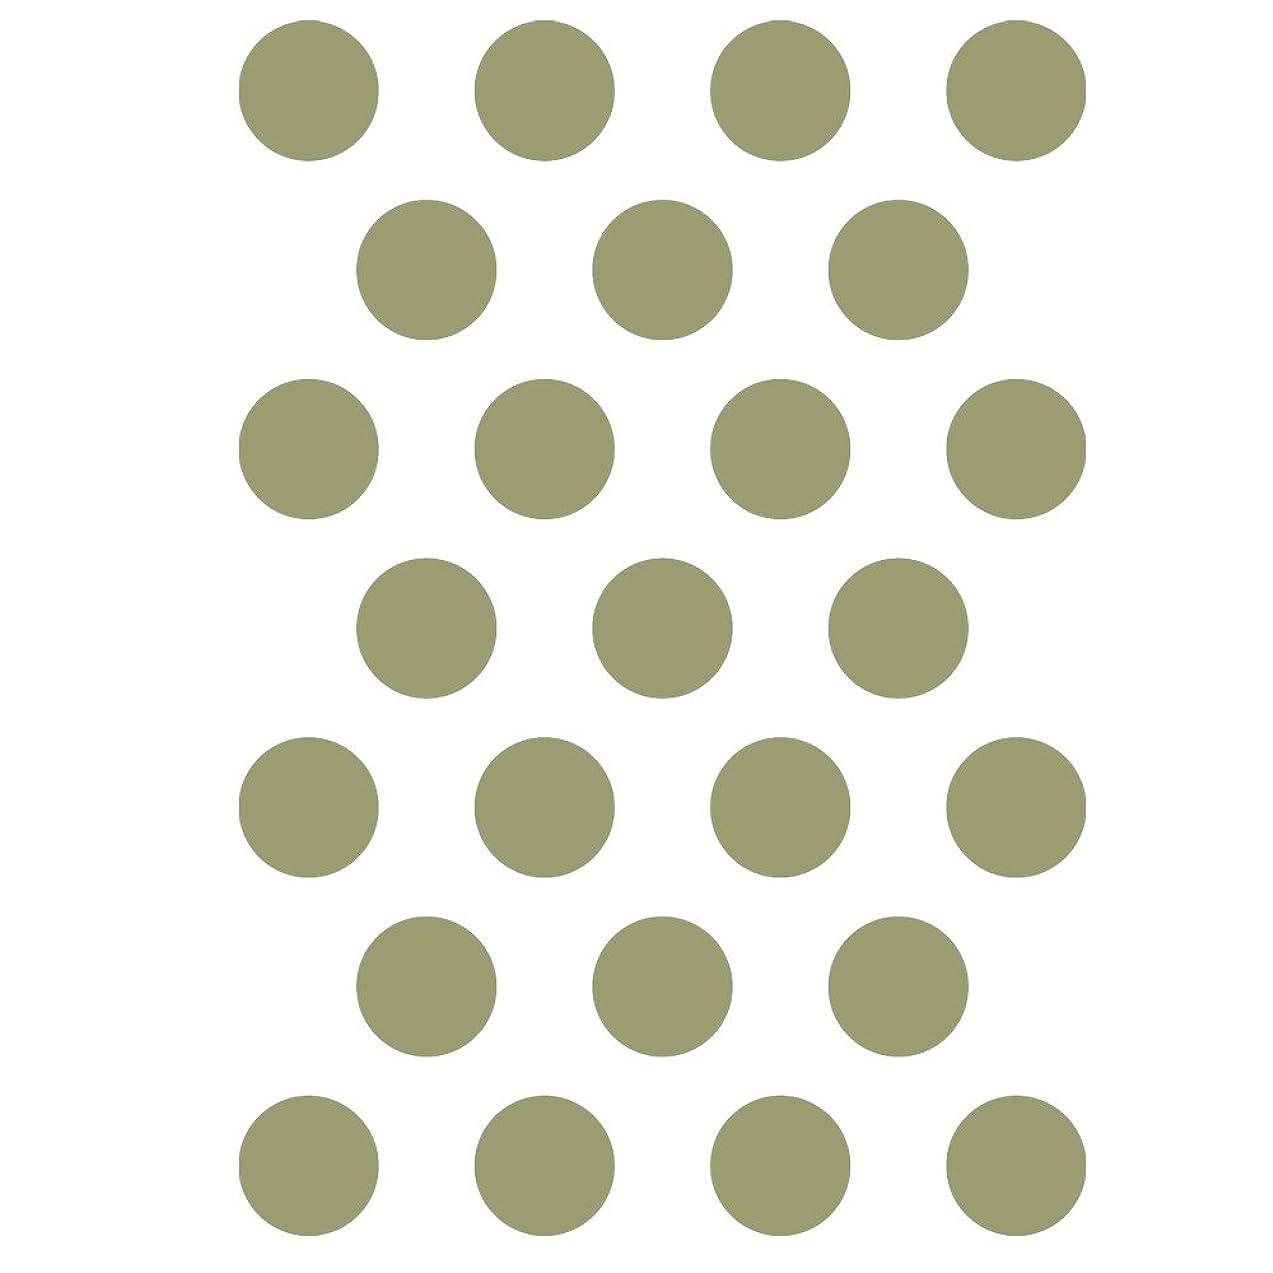 J BOUTIQUE STENCILS Polka Dot Stencils Reusable Template for Crafting Canvas DIY decor Wall art furniture